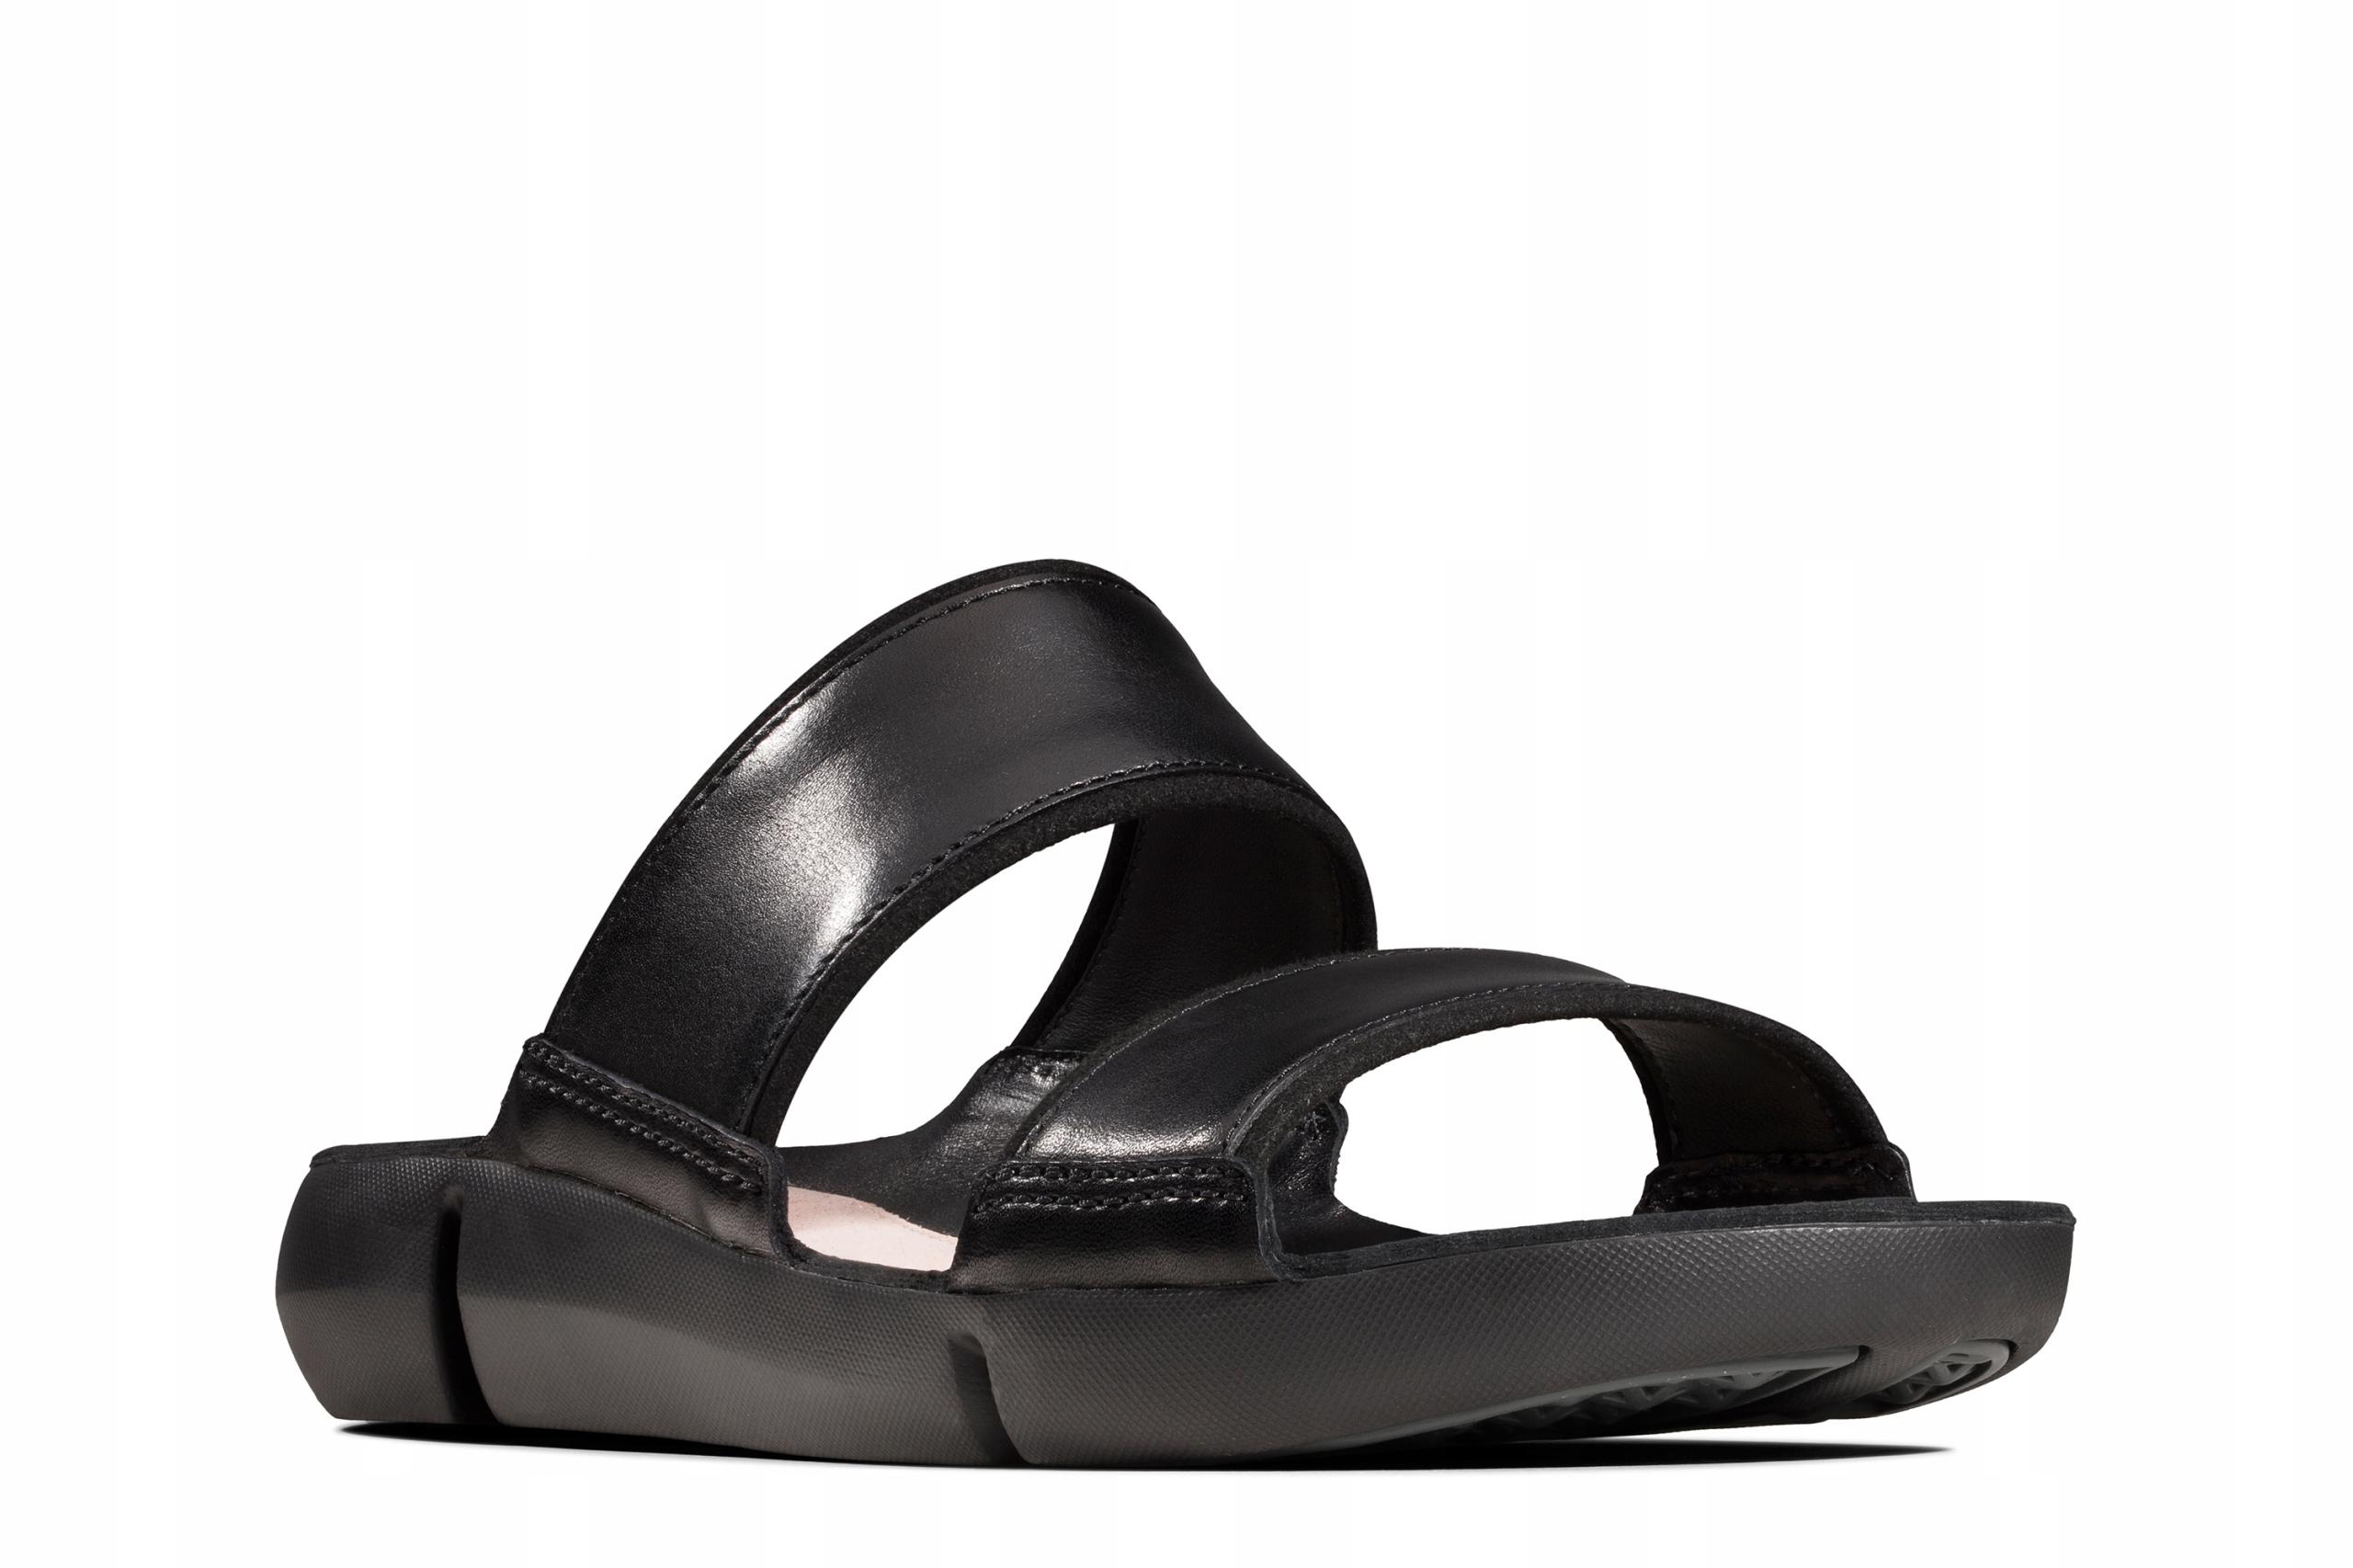 KLAPKI CLARKS TRI SARA Black Leather 37,5